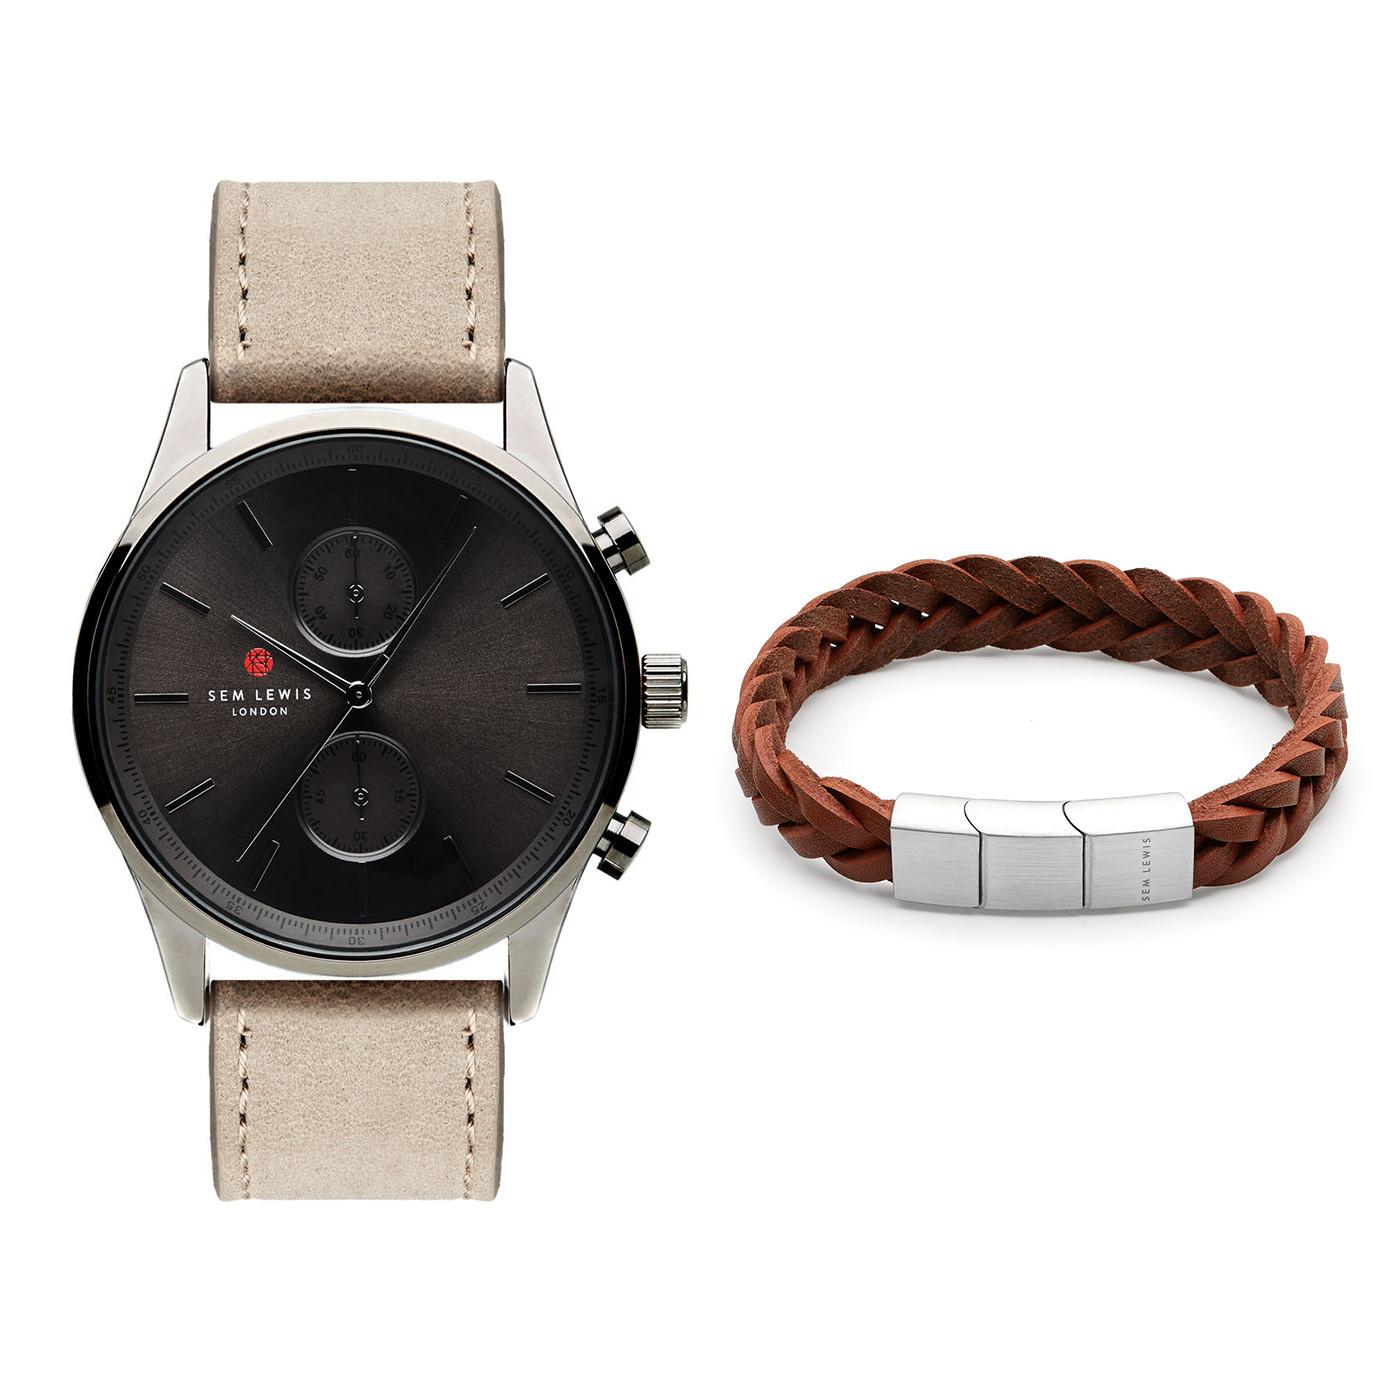 Sem Lewis Metropolitan Chrono horloge en Bakerloo Paddington Armband giftset SL90001